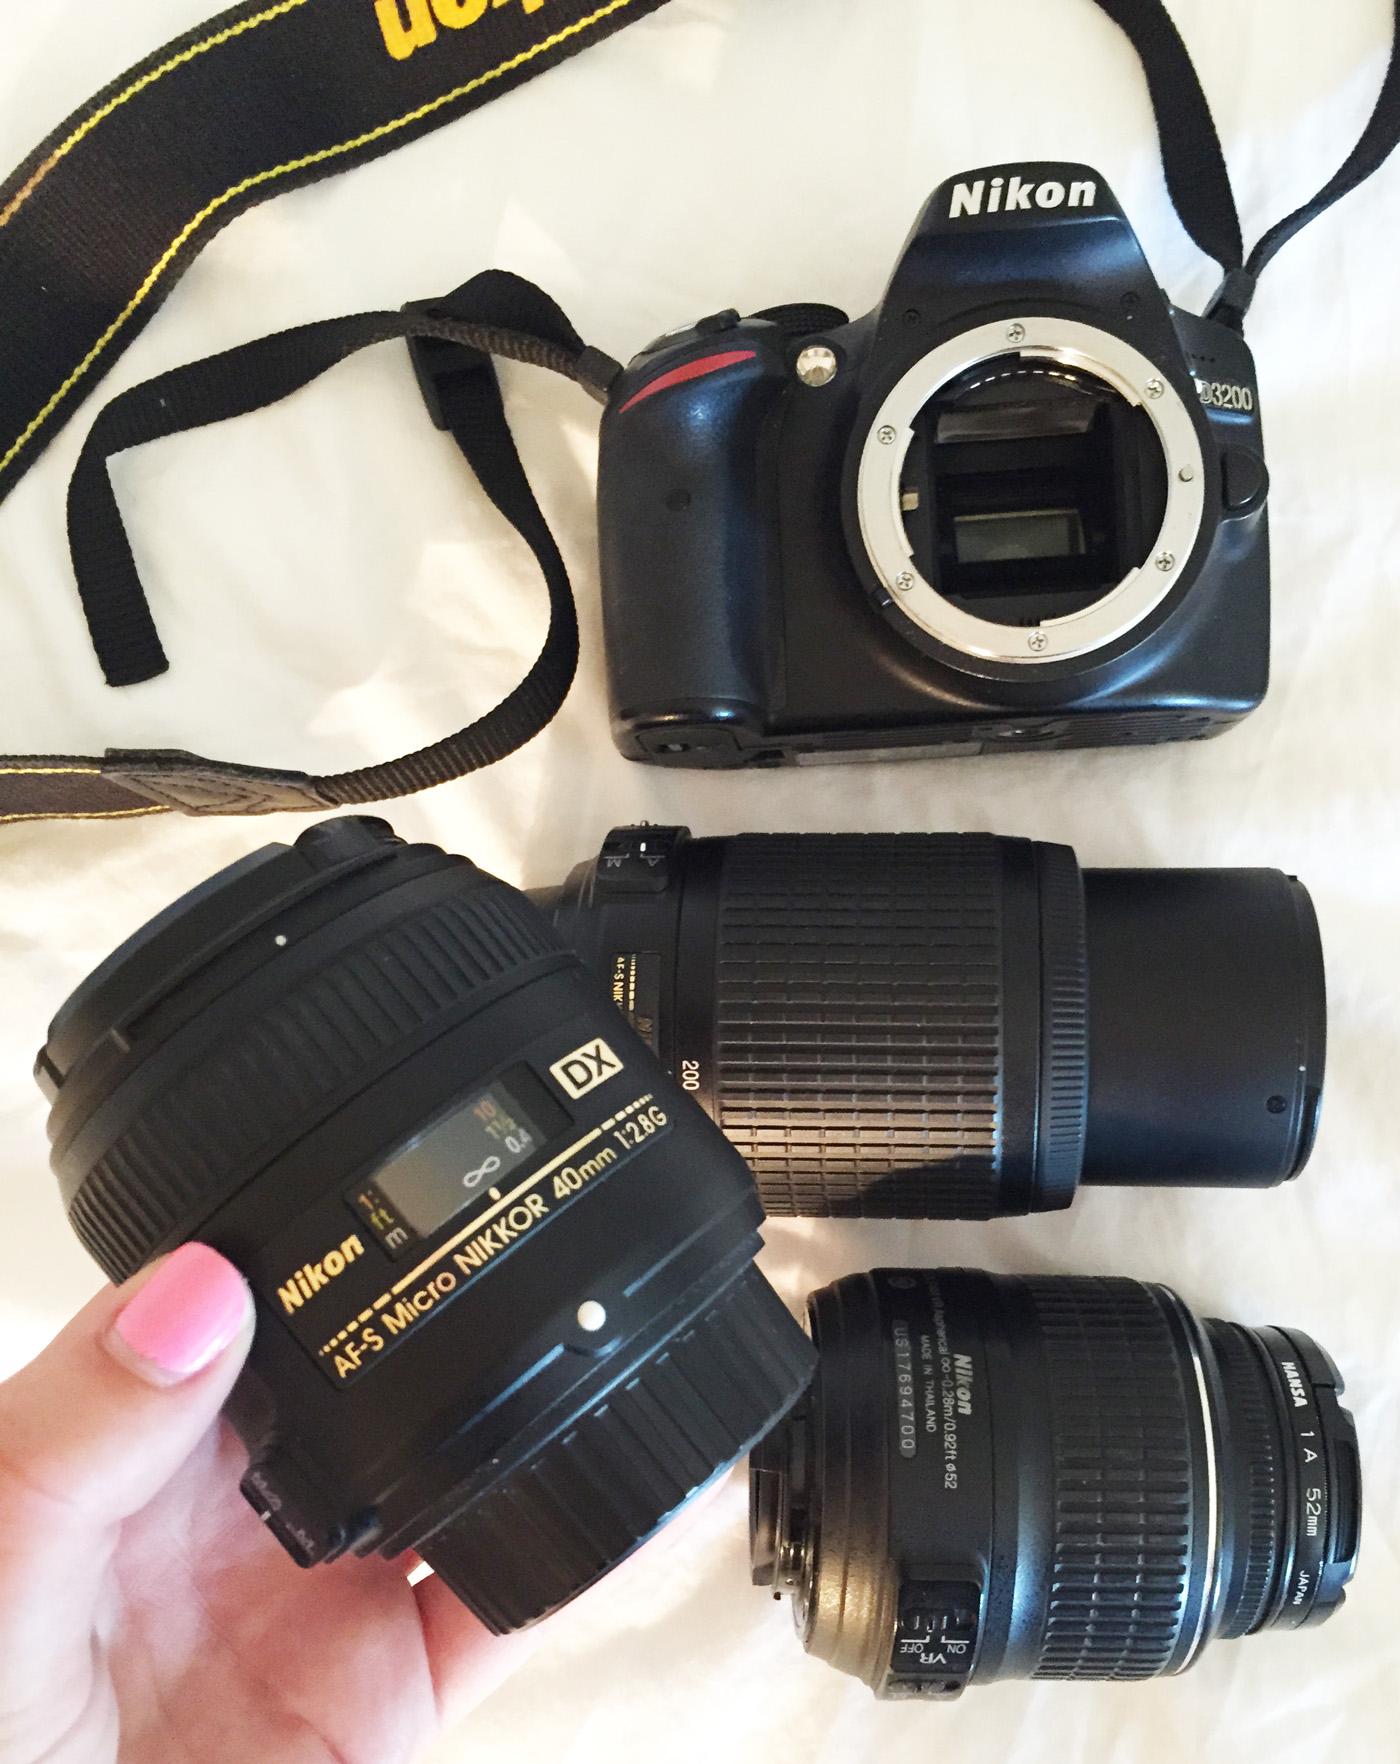 Choosing a DSLR Lens